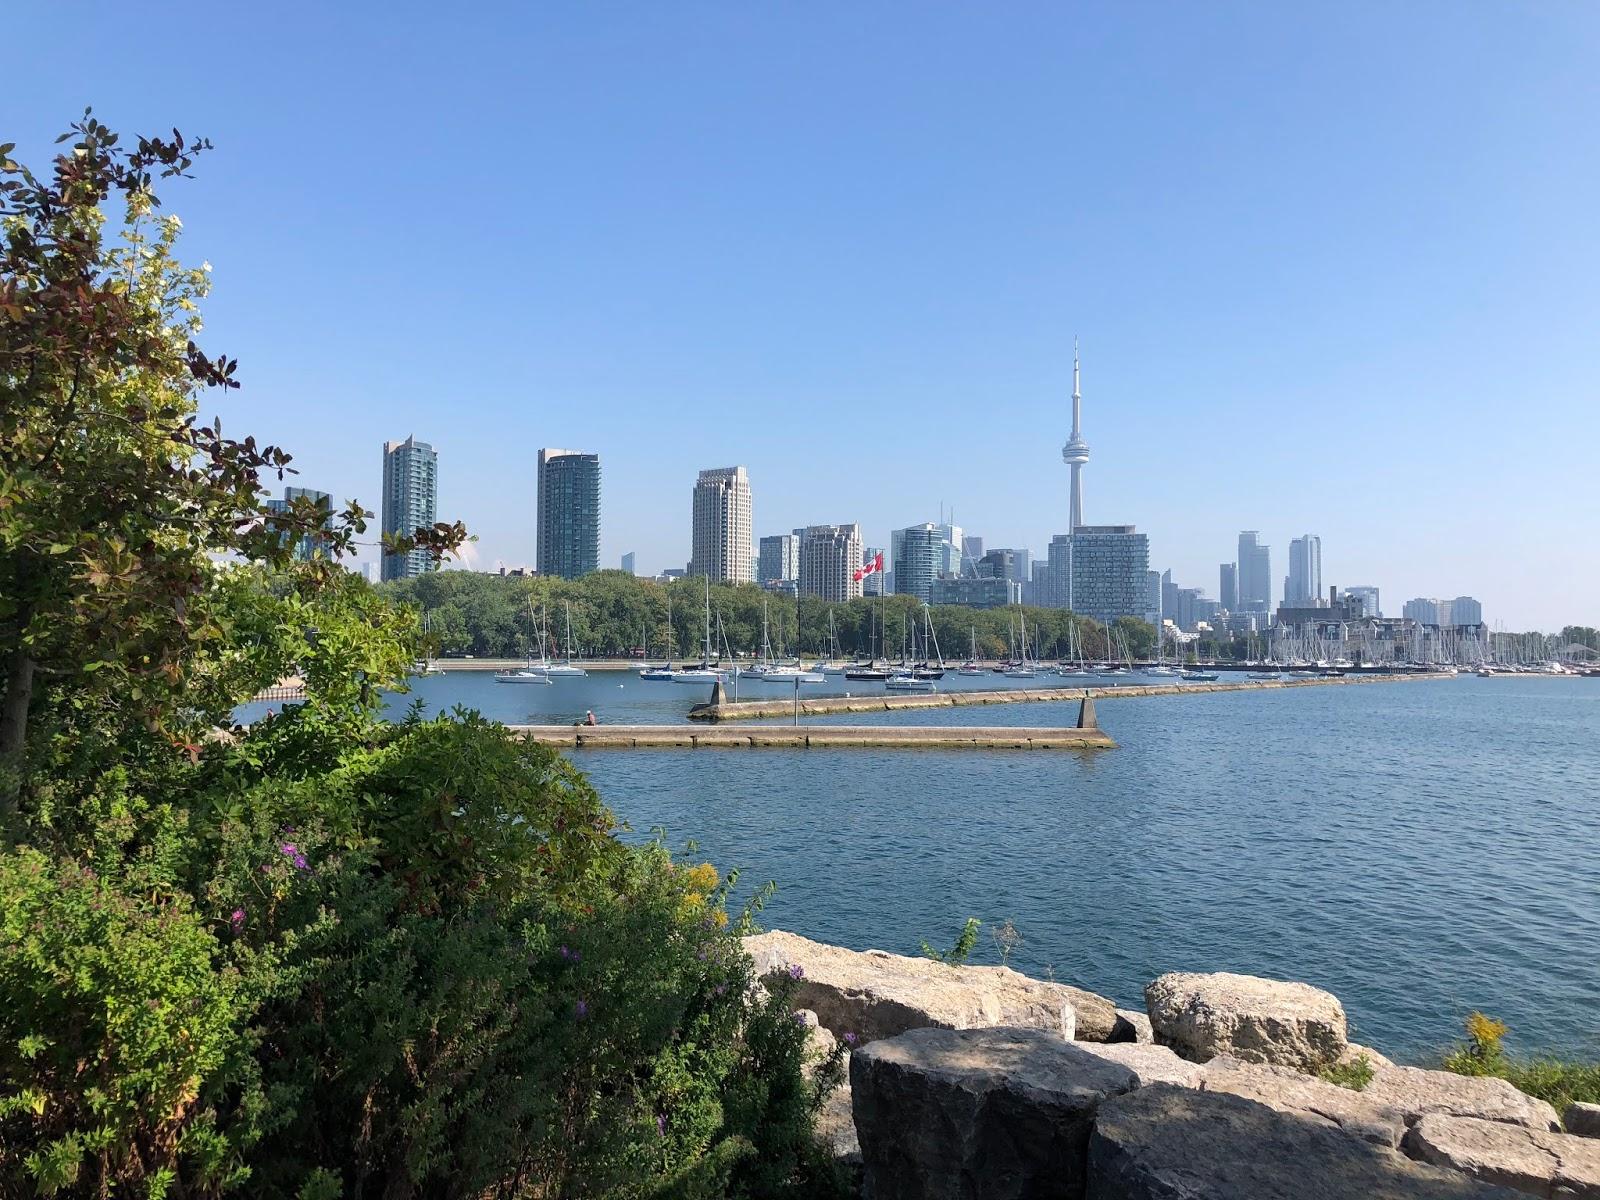 Teena in Toronto: The Famous Canadian Beer Run, Toronto, ON